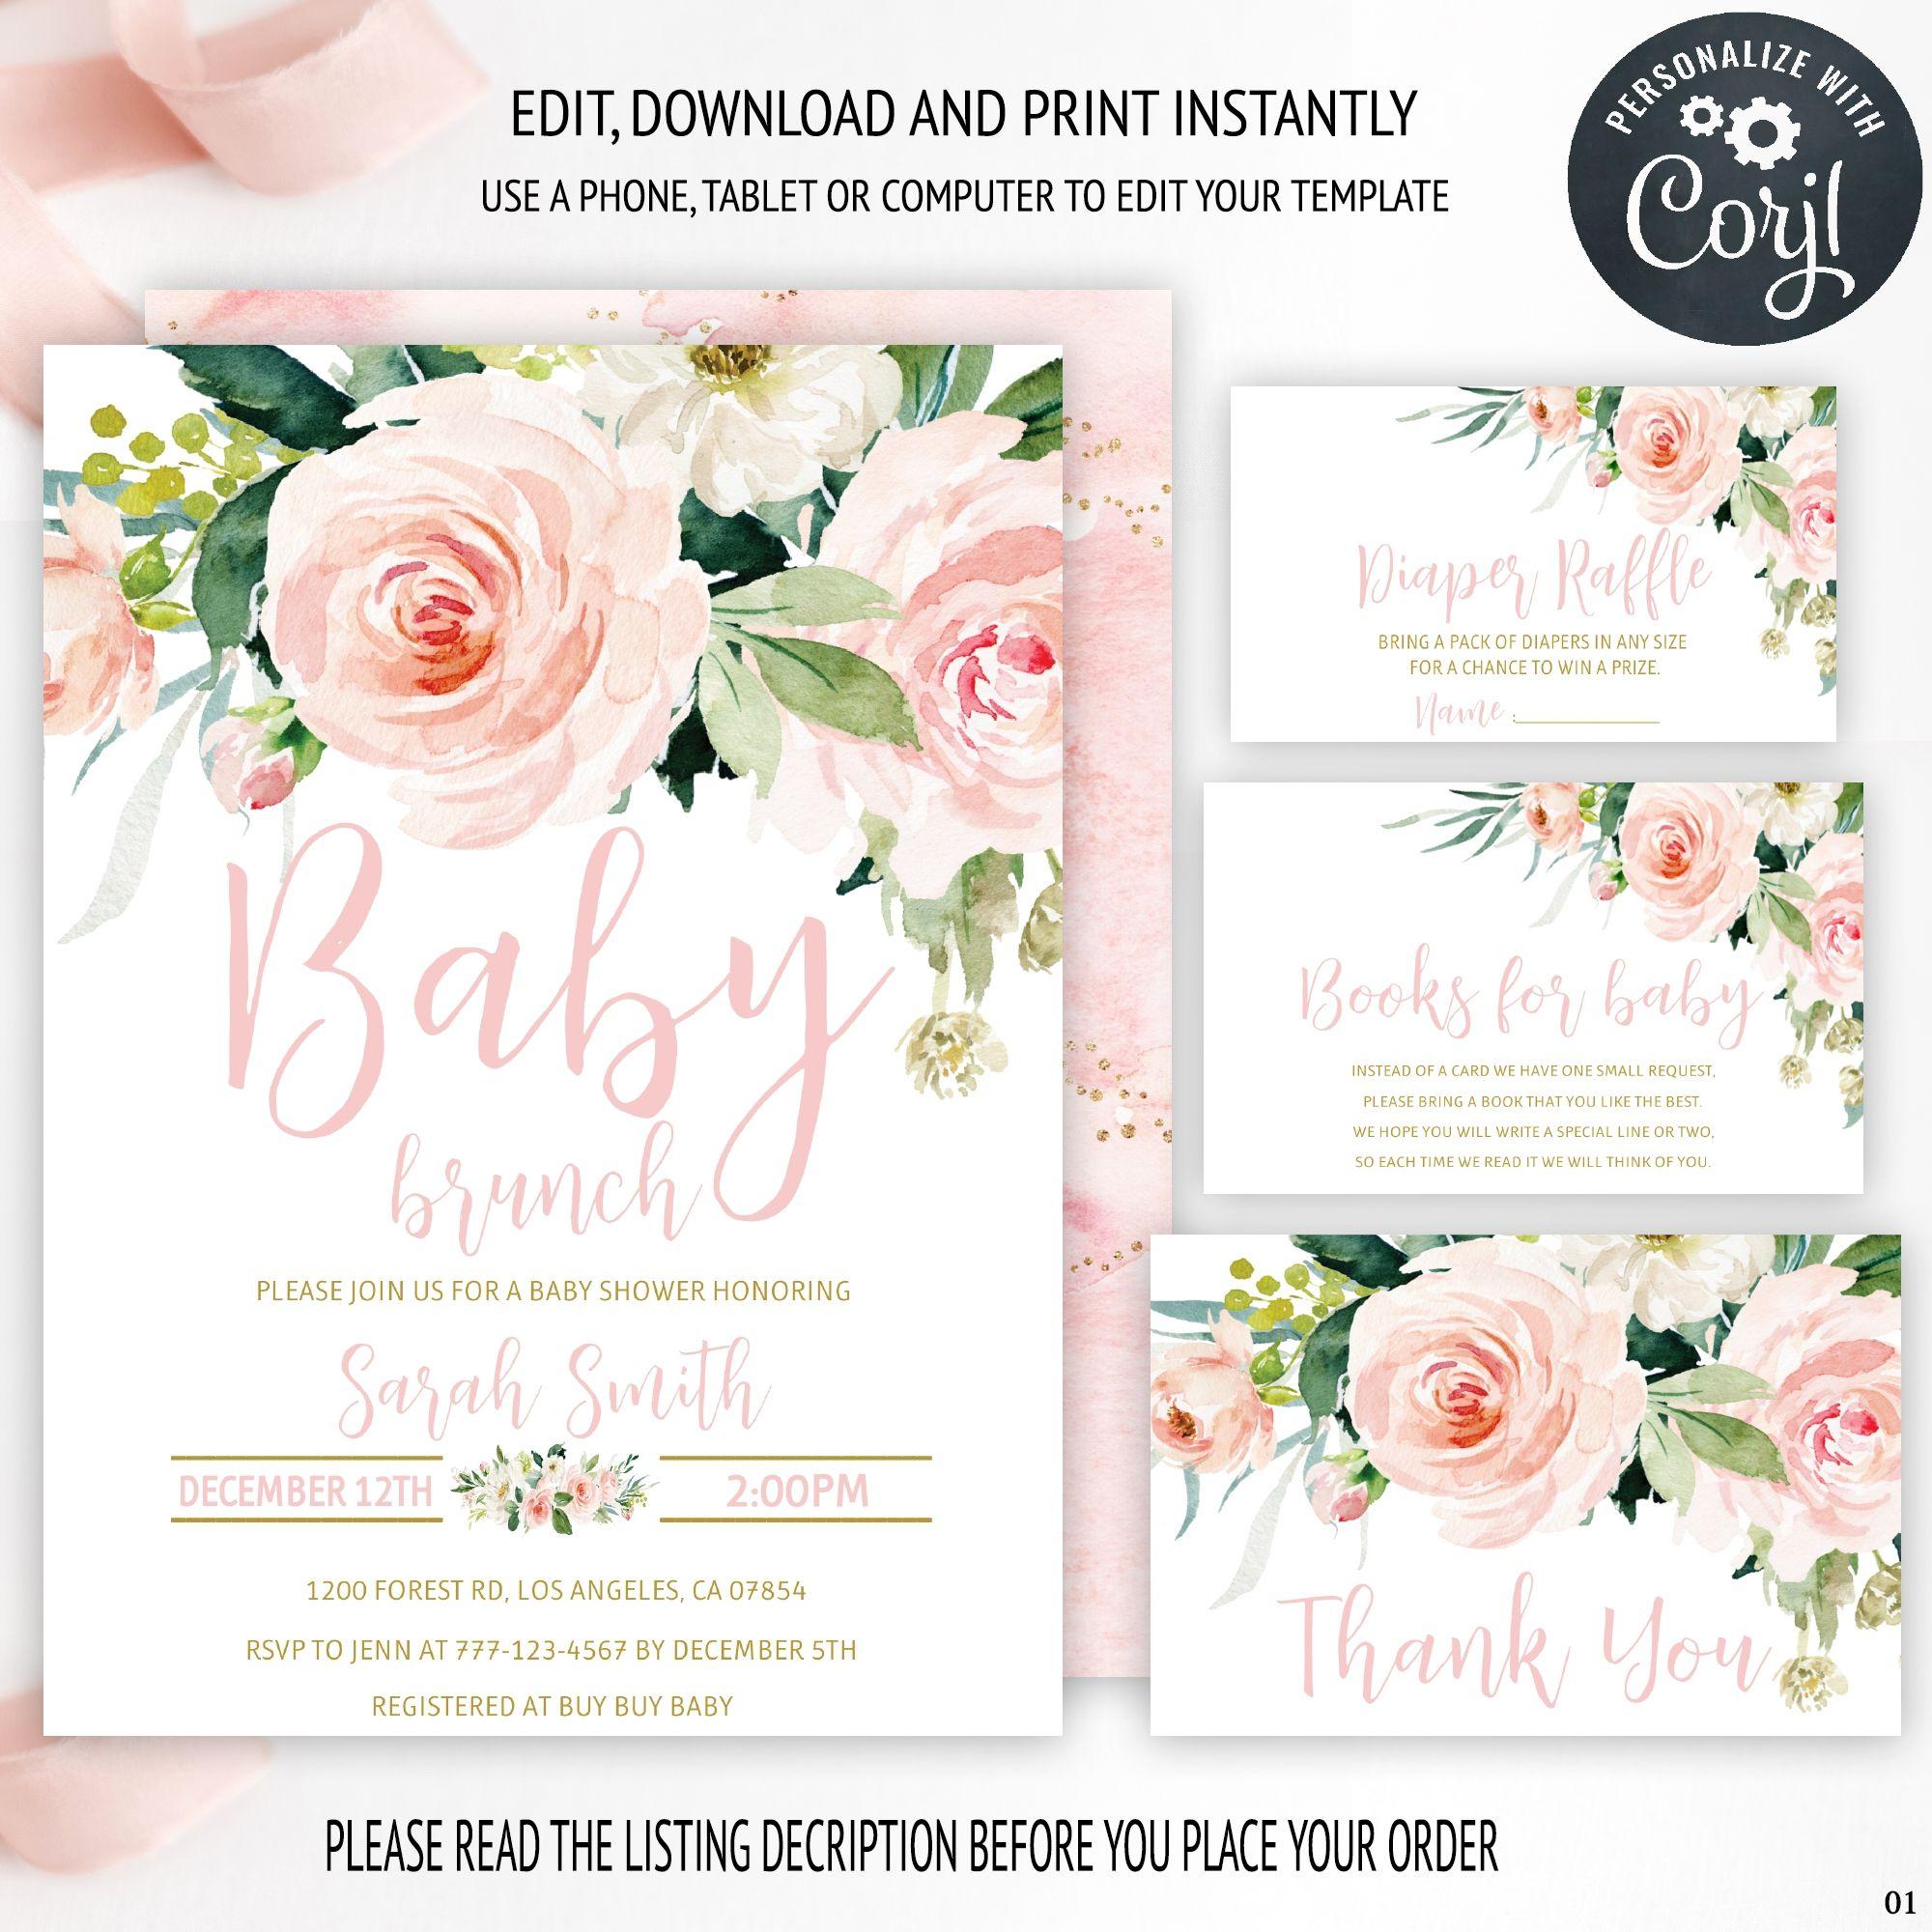 Fall Pumpkin Baby Shower Invitation Bundle Printable Baby Shower Invitation Template Corjl EDITABLE Invitation Autumn Baby Girl